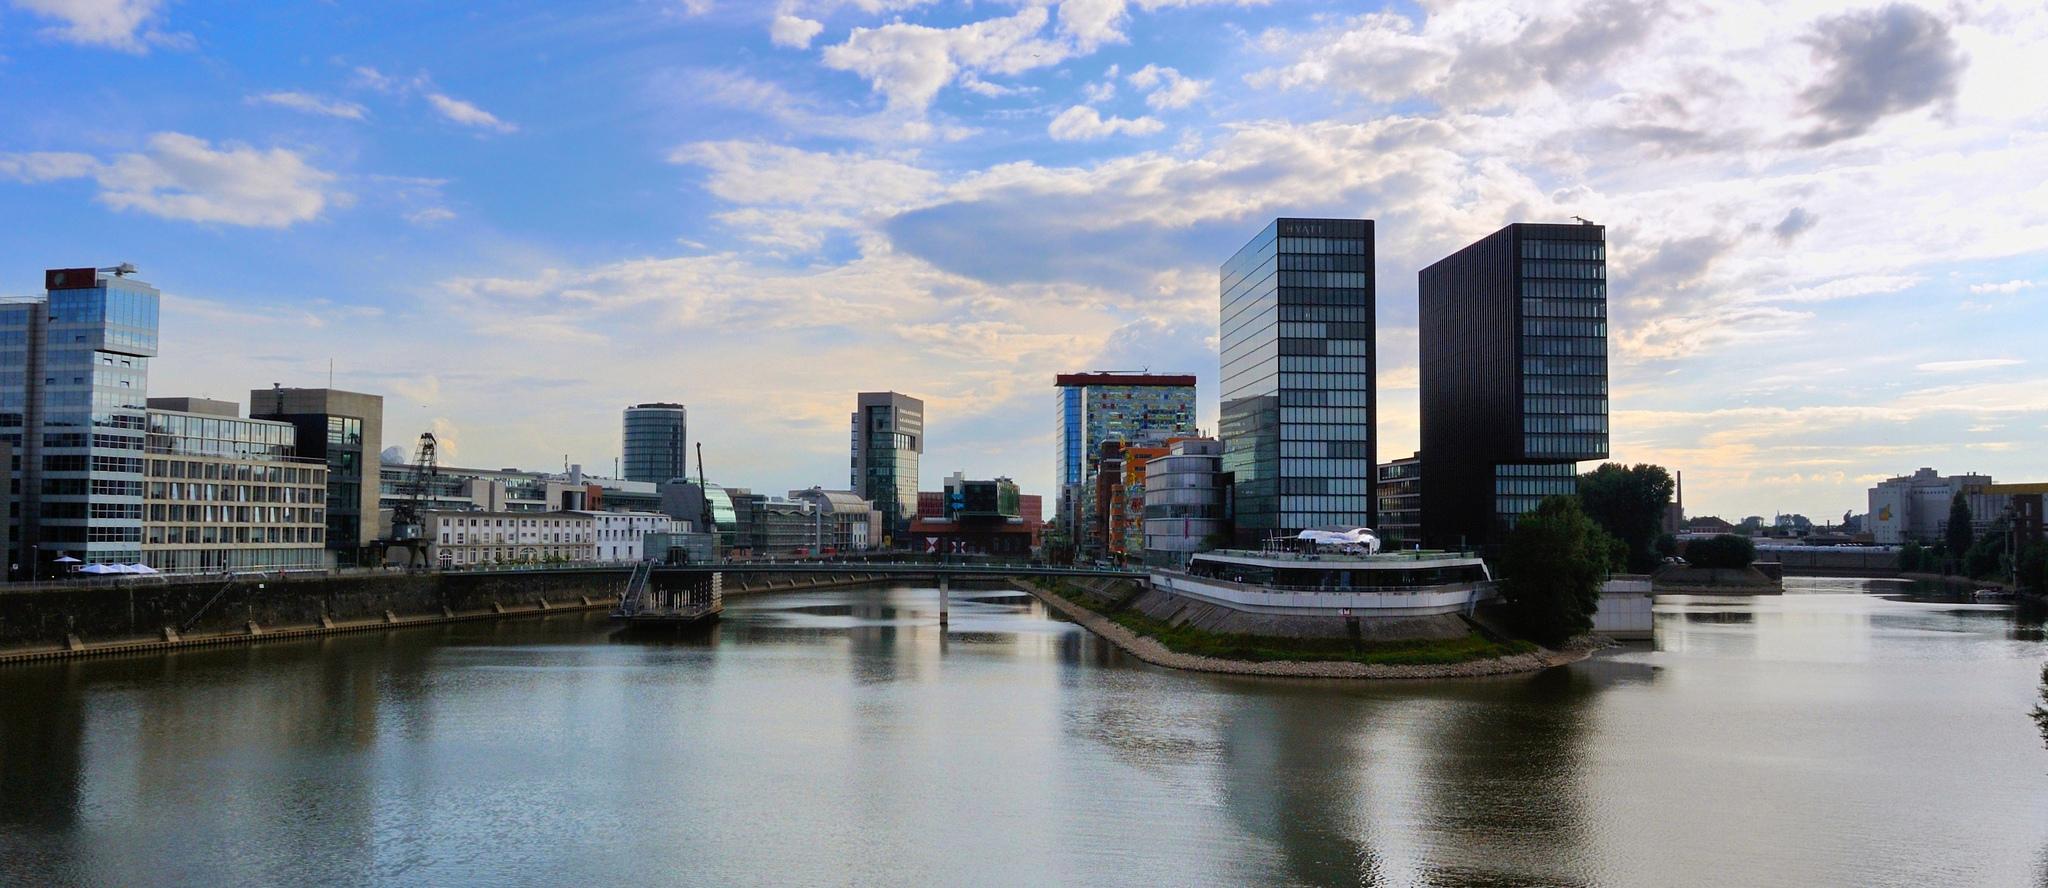 7 Stunning Things To See Amp Do In Bilk Dsseldorf